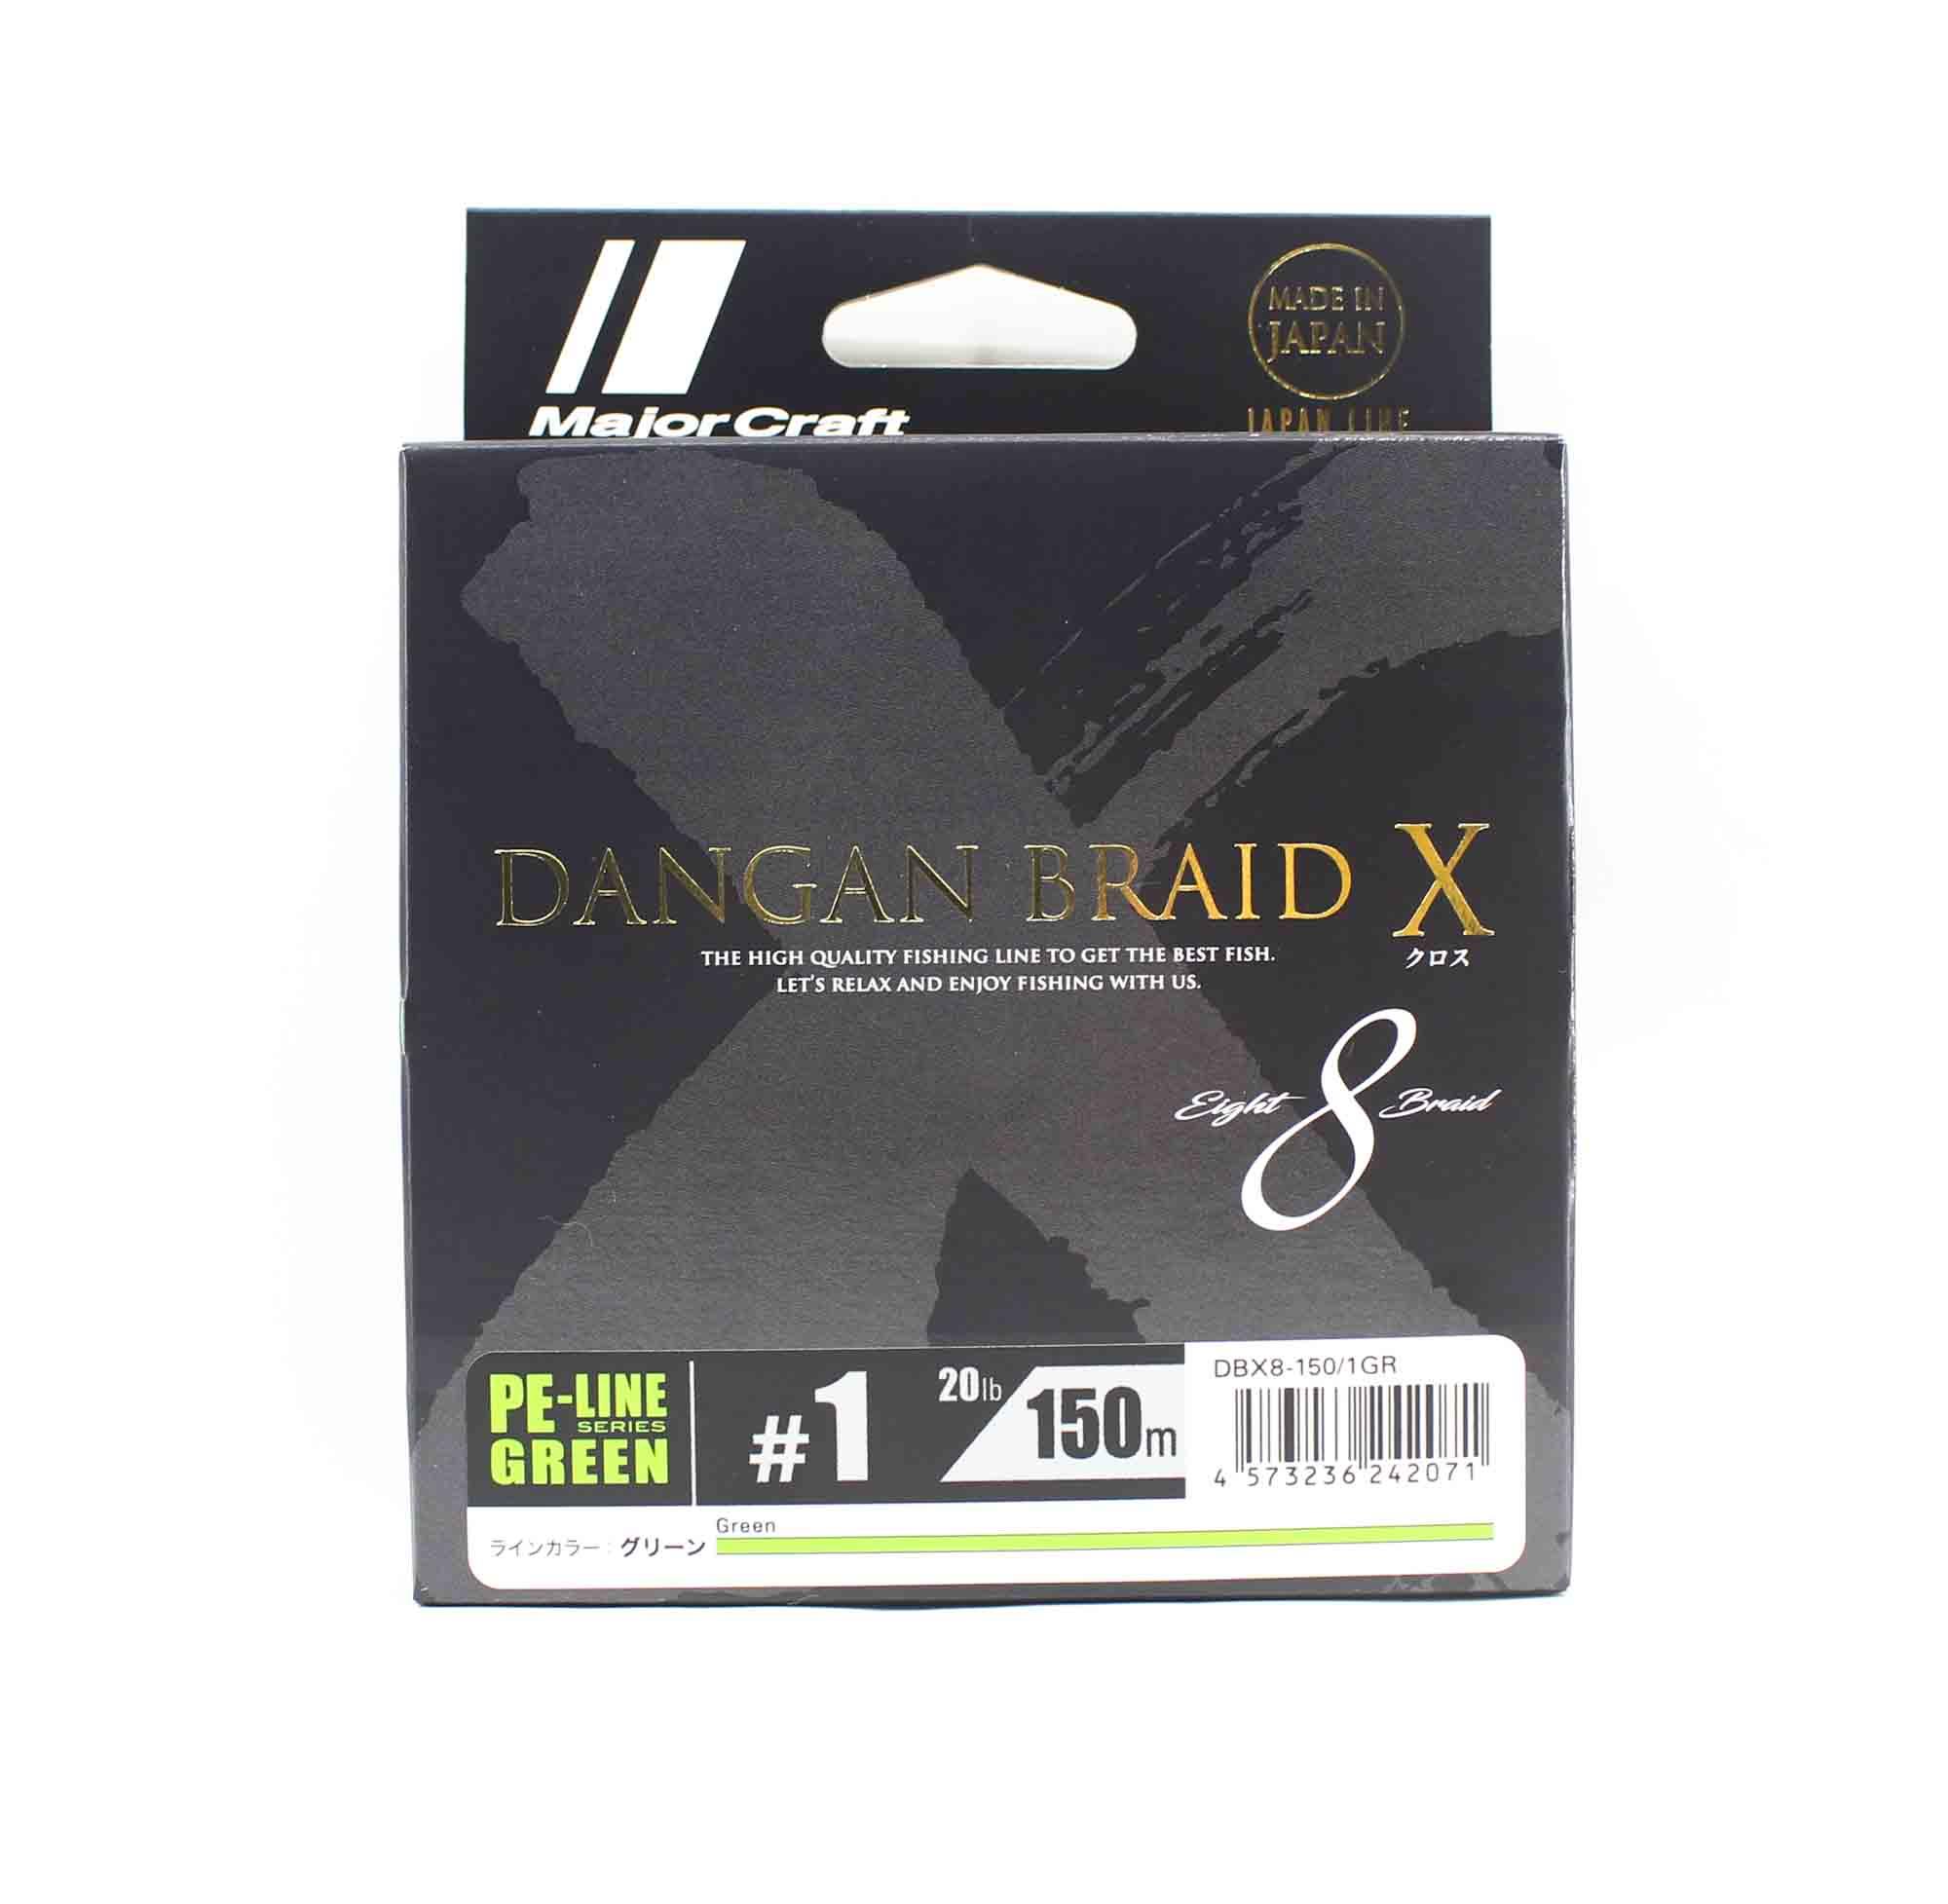 Major Craft Dangan Braid X Line X8 150m P.E 1 Green DBX8-150/1GR (2071)